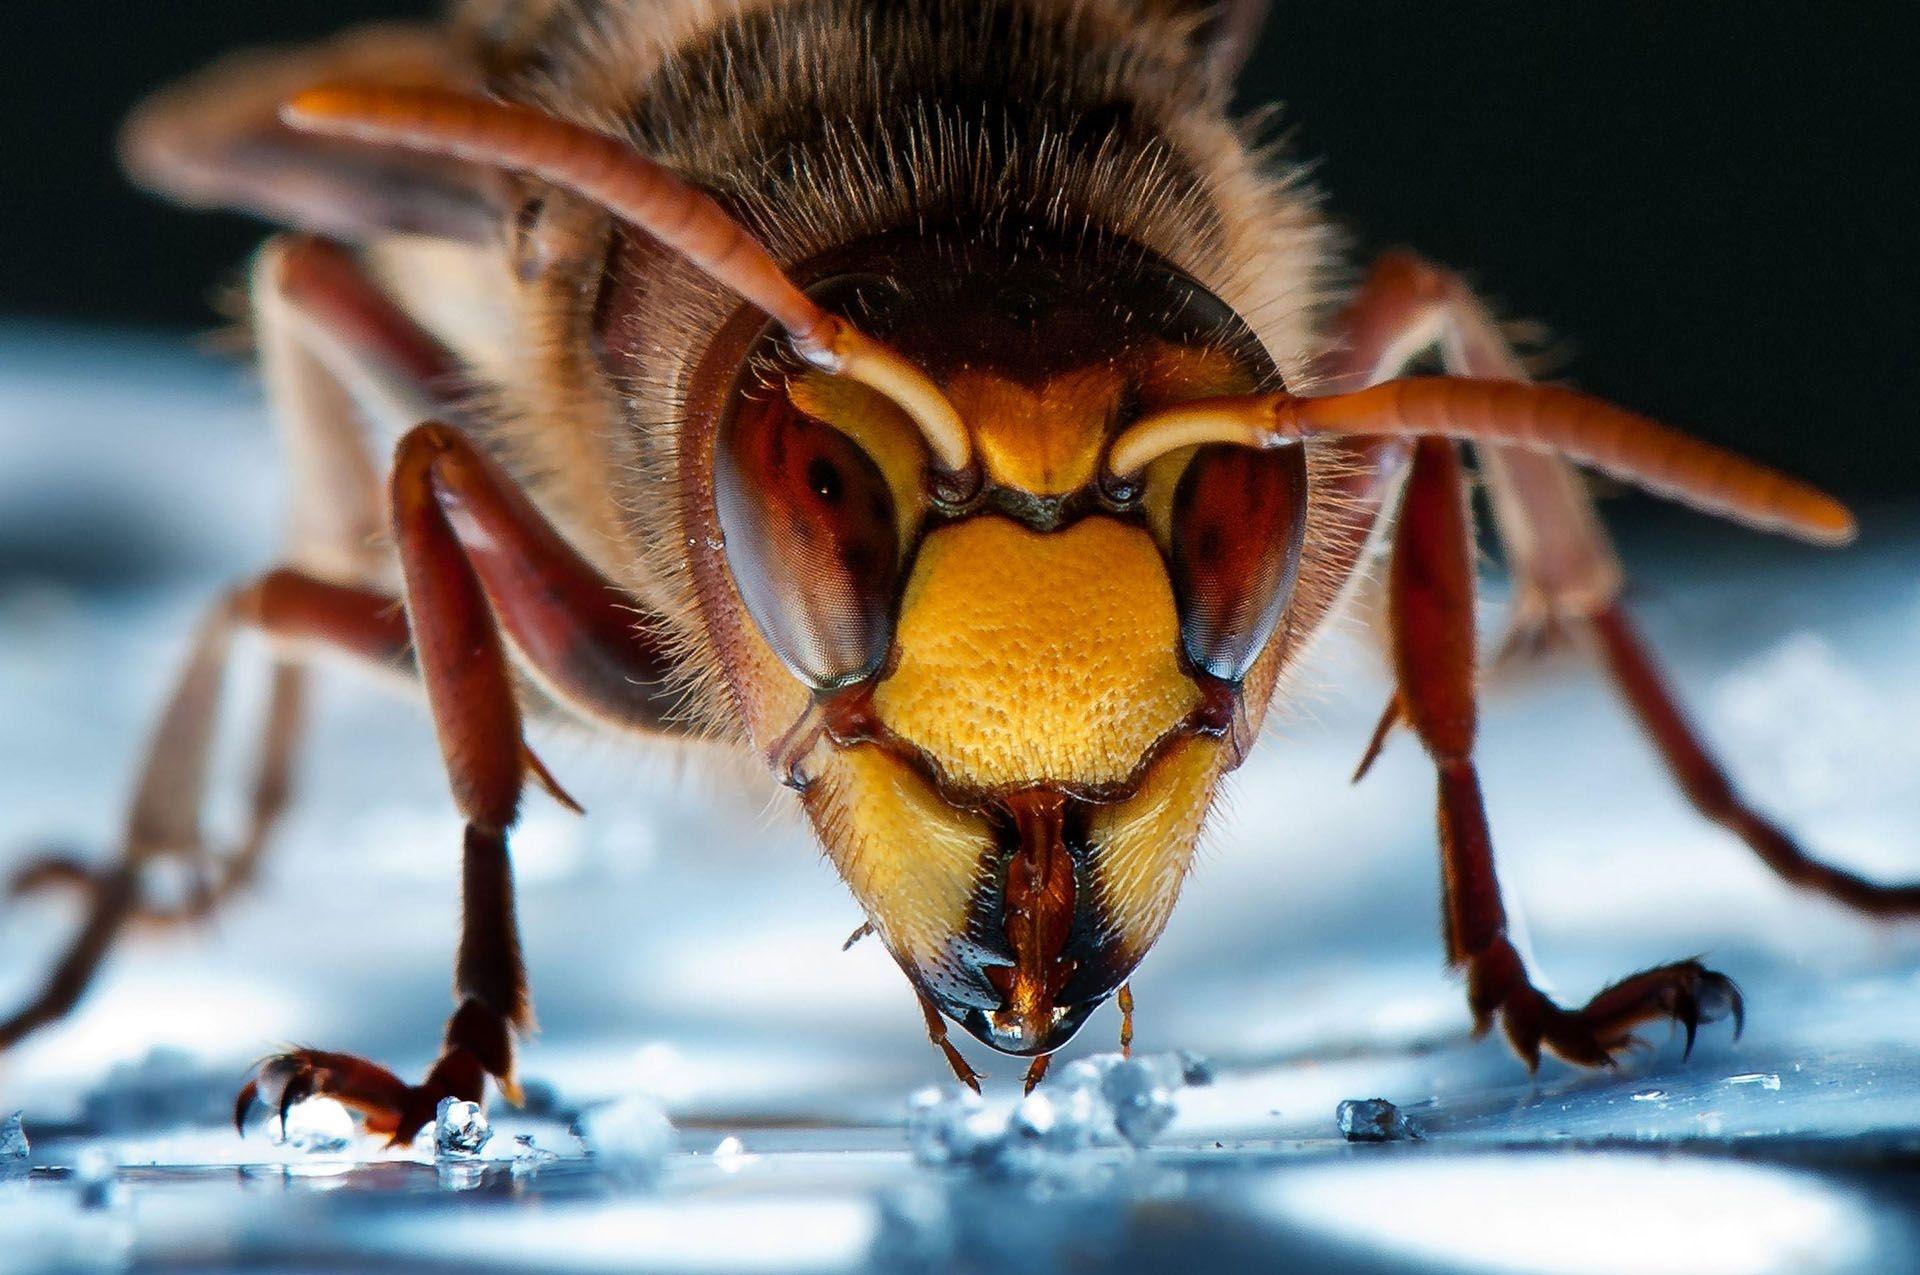 Photograph by Wolfgang Korazija, National Geographic